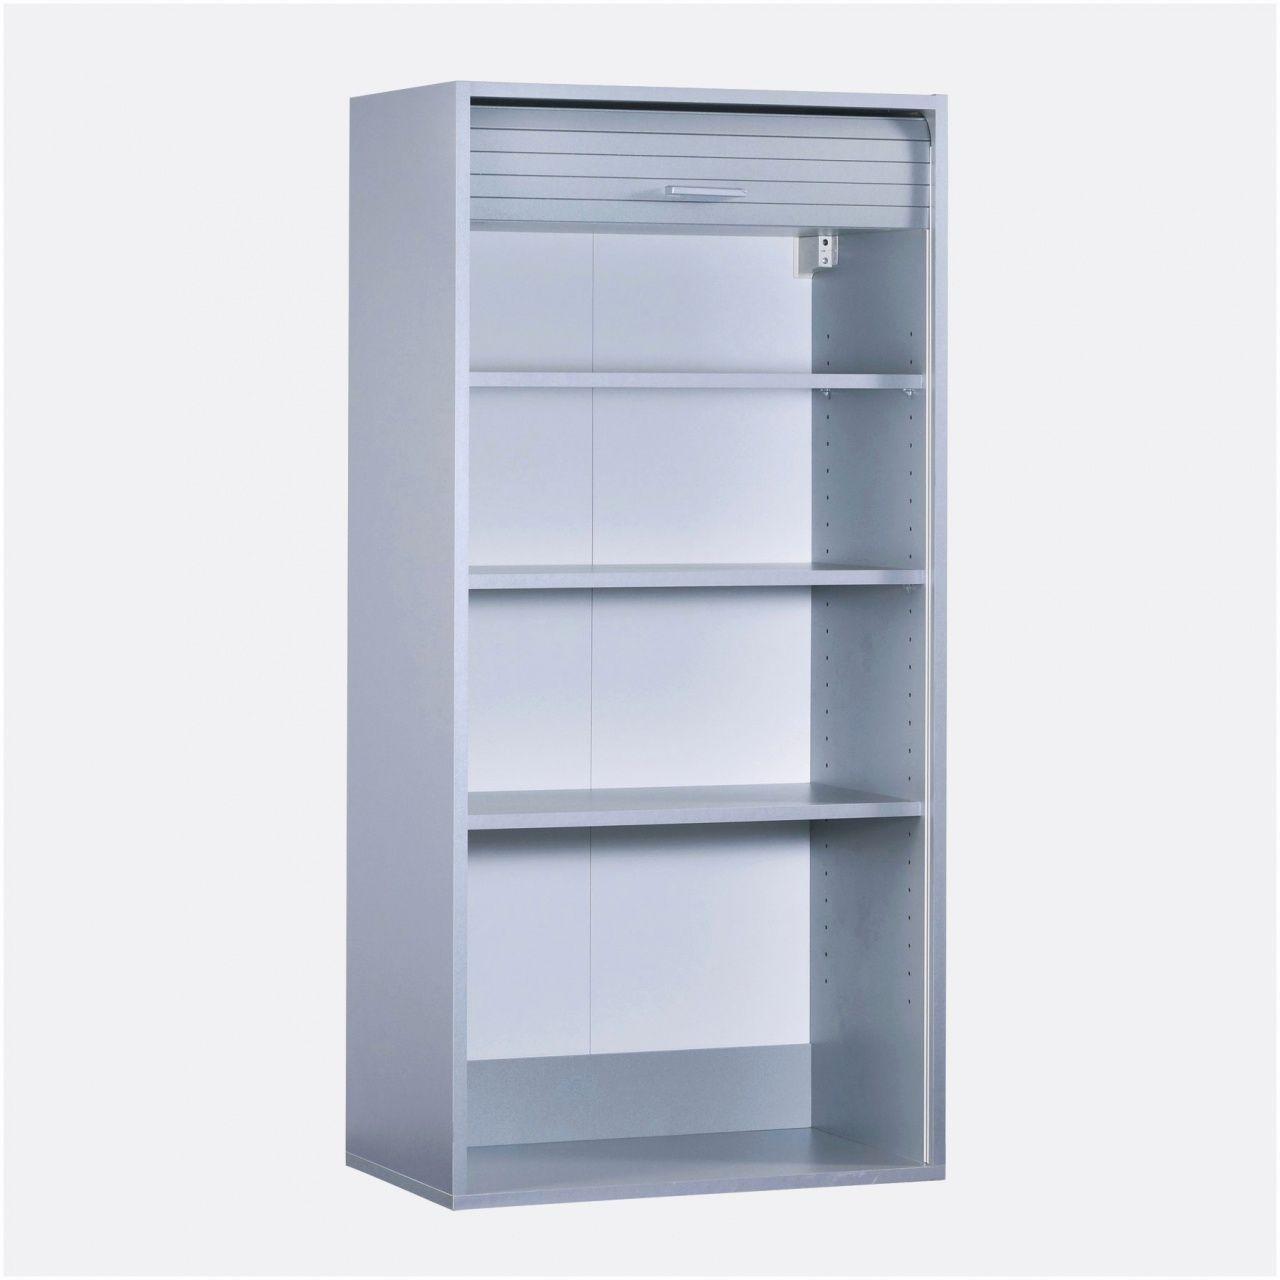 200 Meuble Cuisine Avec Rideau Coulissant Bathroom Medicine Cabinet Locker Storage Kitchen Remodel